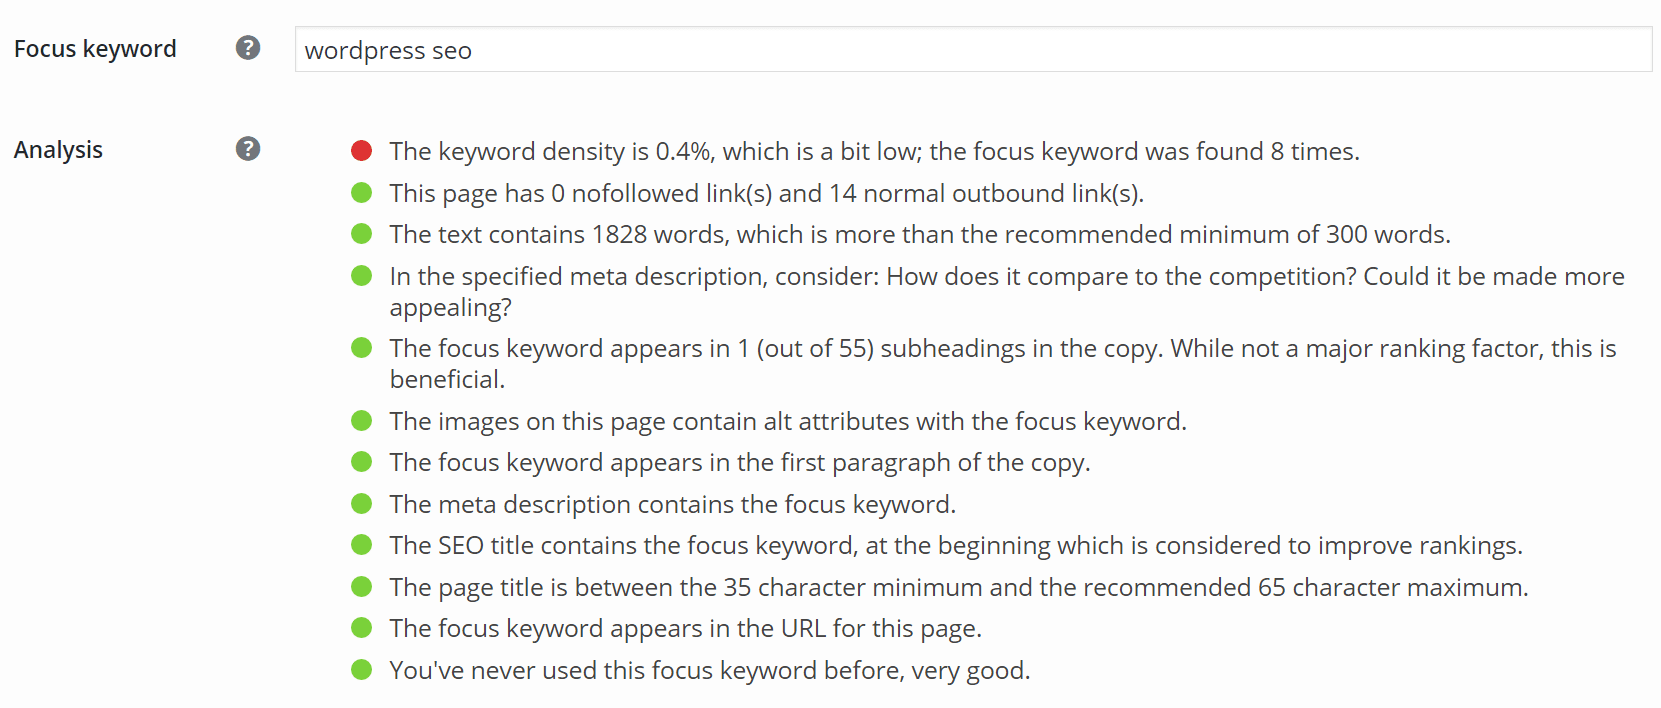 wordpress seo palabra clave objetivo